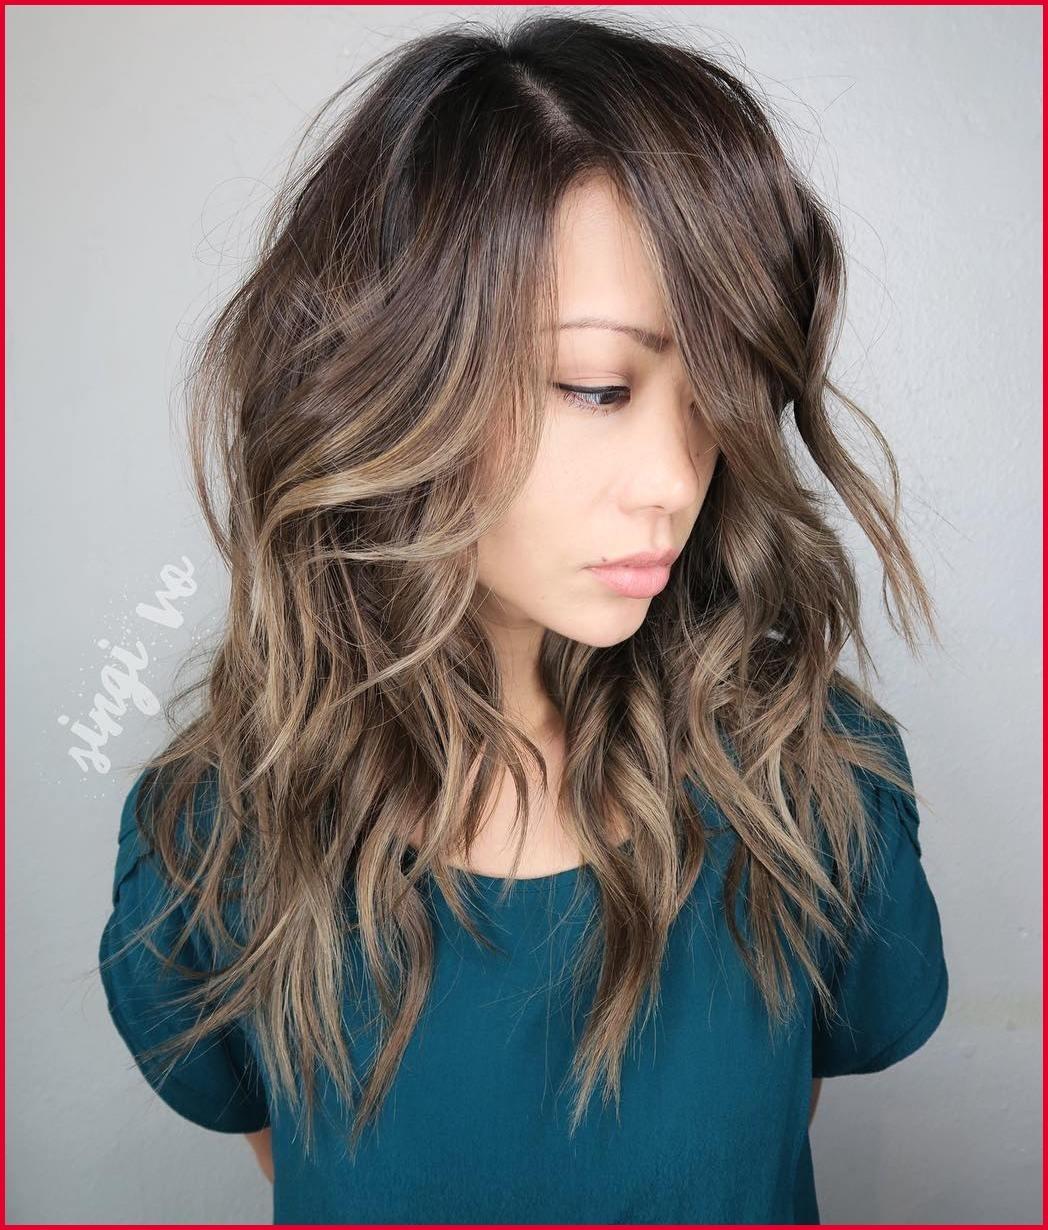 Haircuts For Thick Hair Oblong Face Wavy Haircut